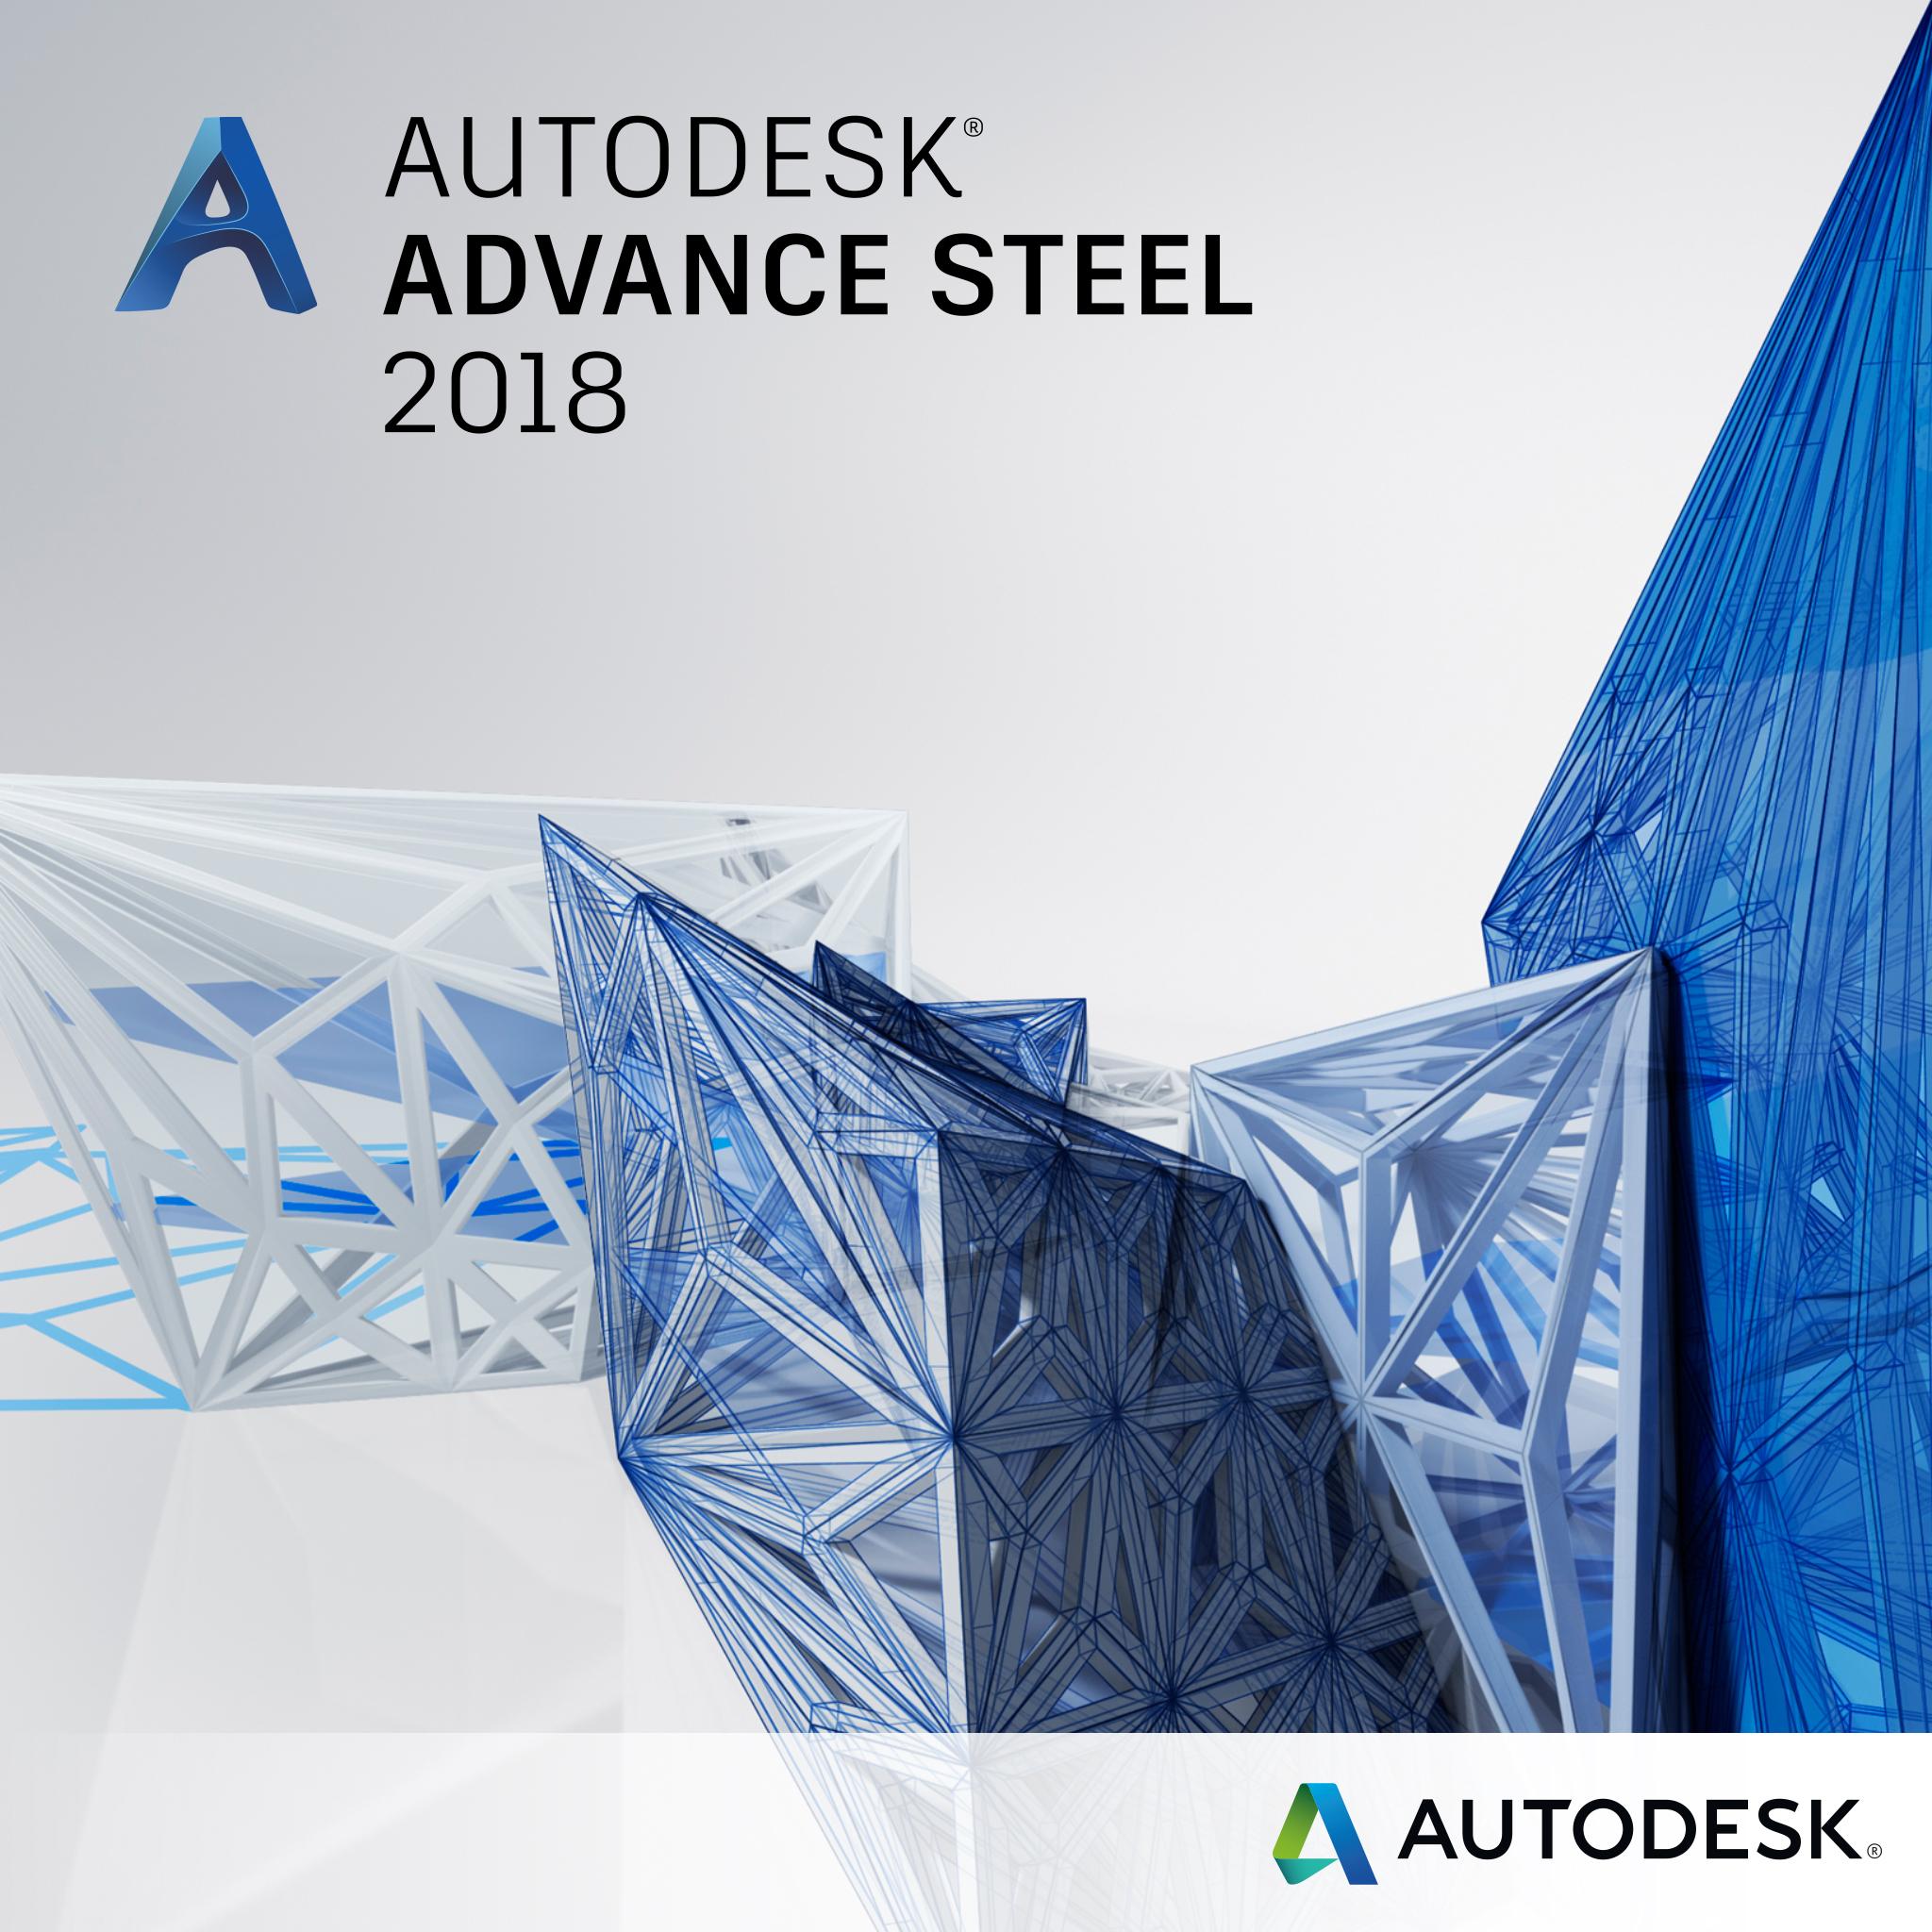 Autodesk Advance Steel badge